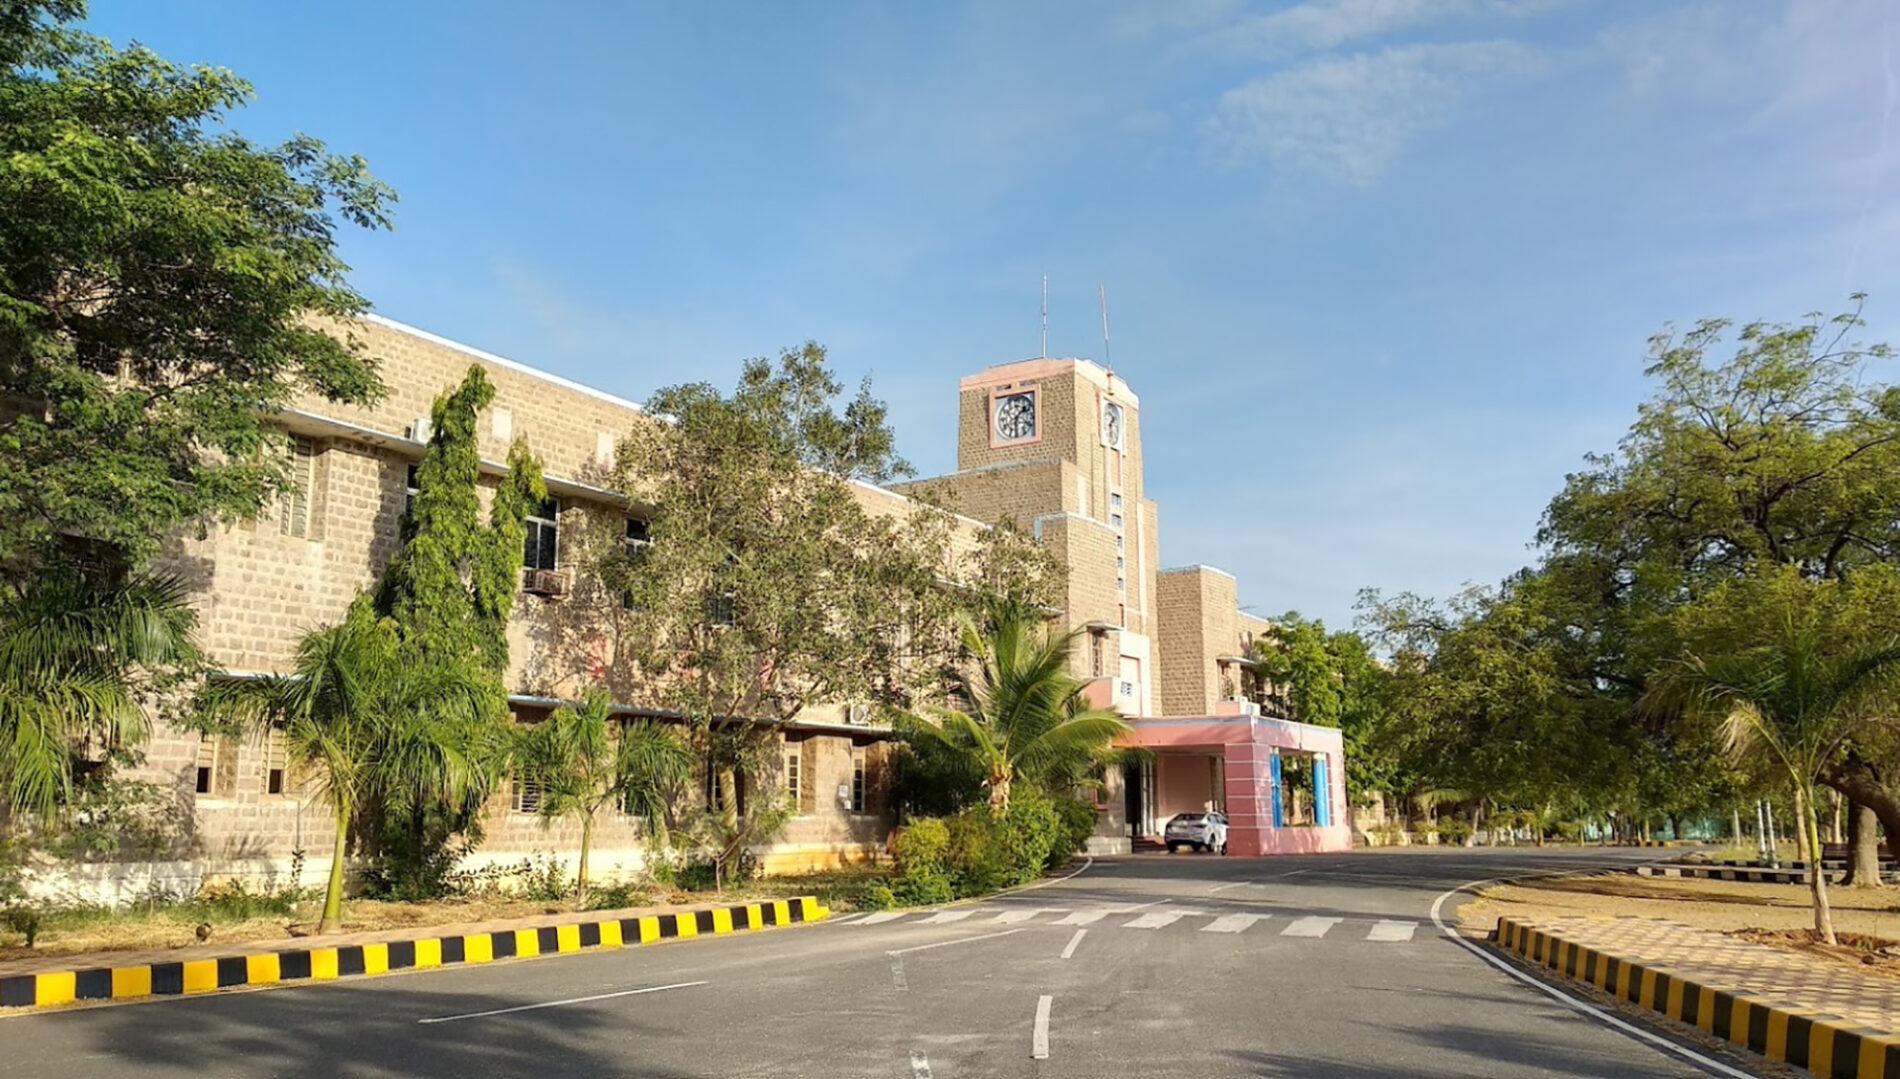 Jawaharlal Nehru Technological University, Anantapur